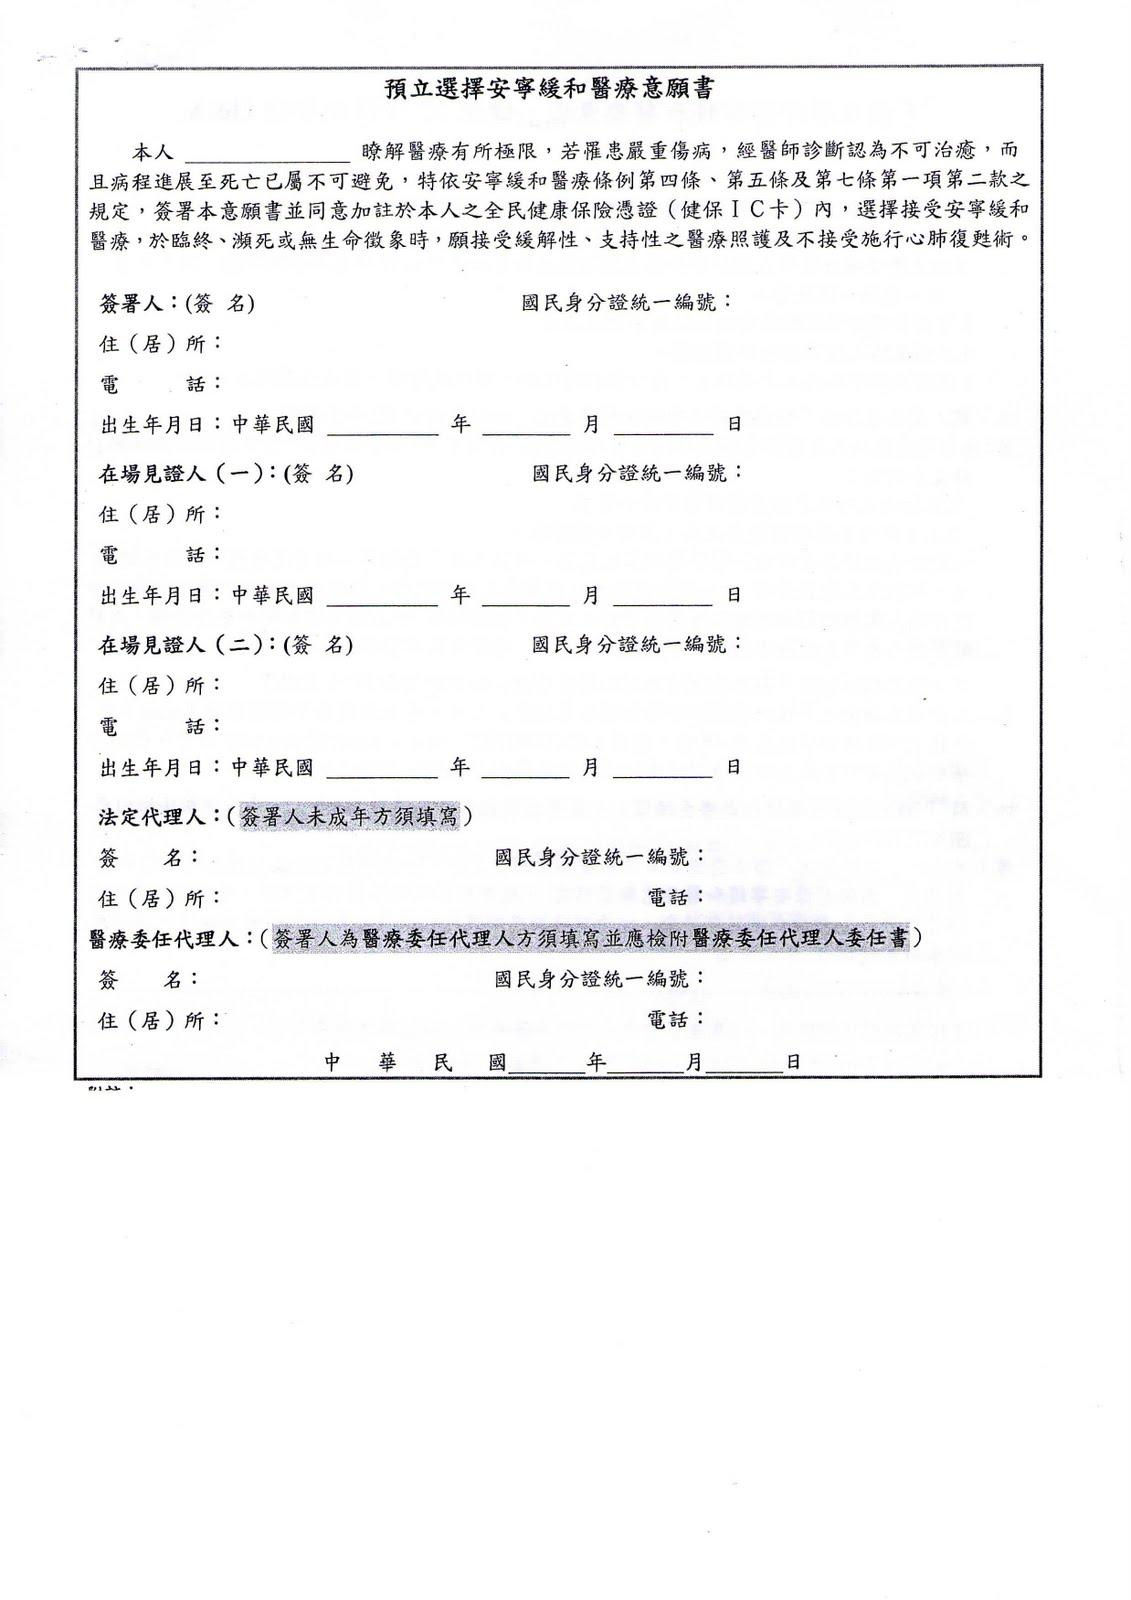 陳榮基部落格 RONG-CHI CHEN BLOG學醫與學佛: 2010/08